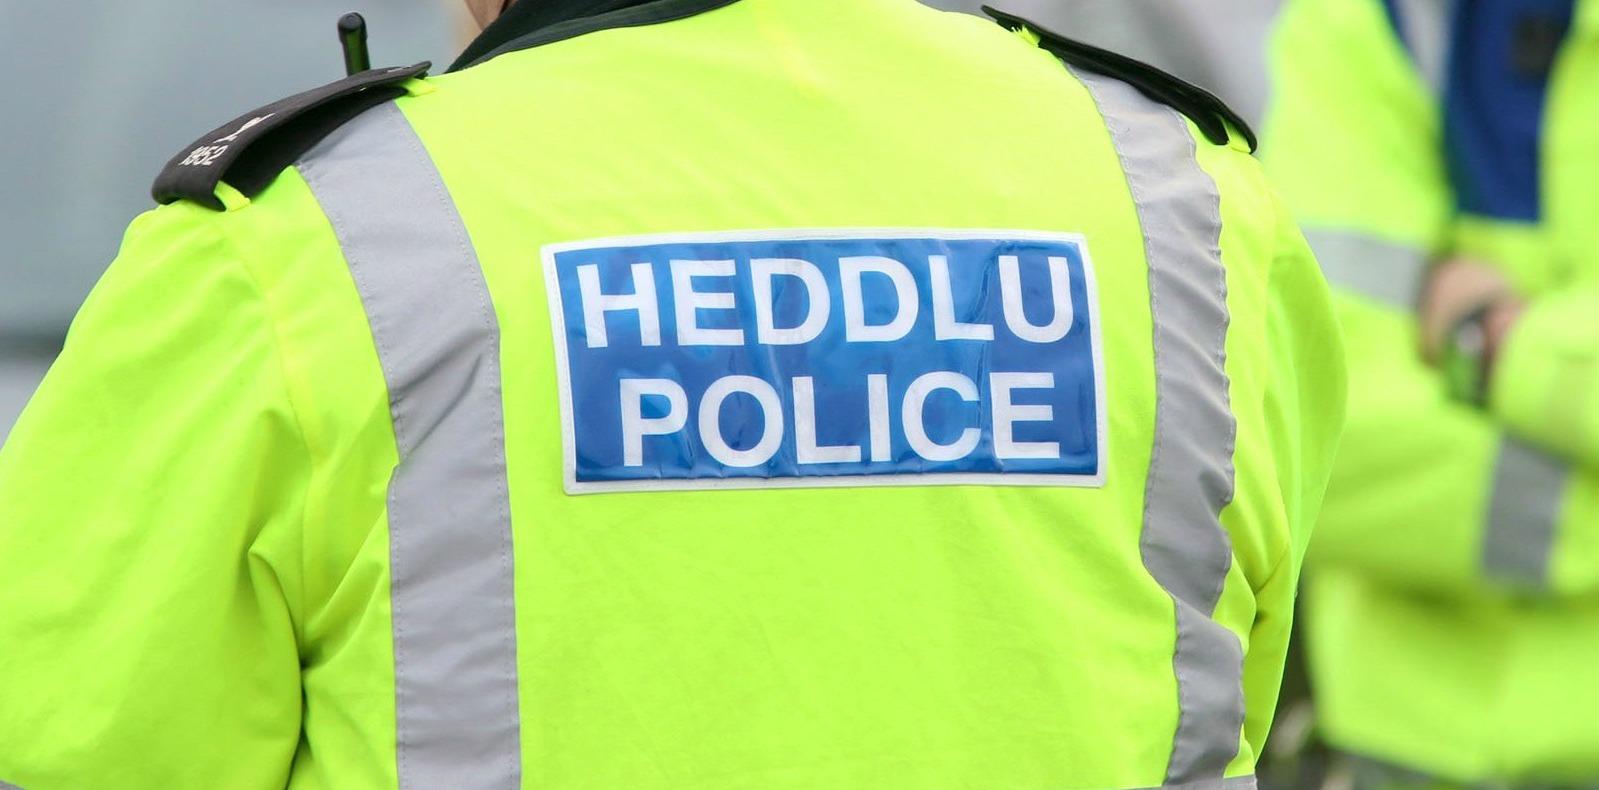 Crew Green burglary: Mountain bike and tools stolen